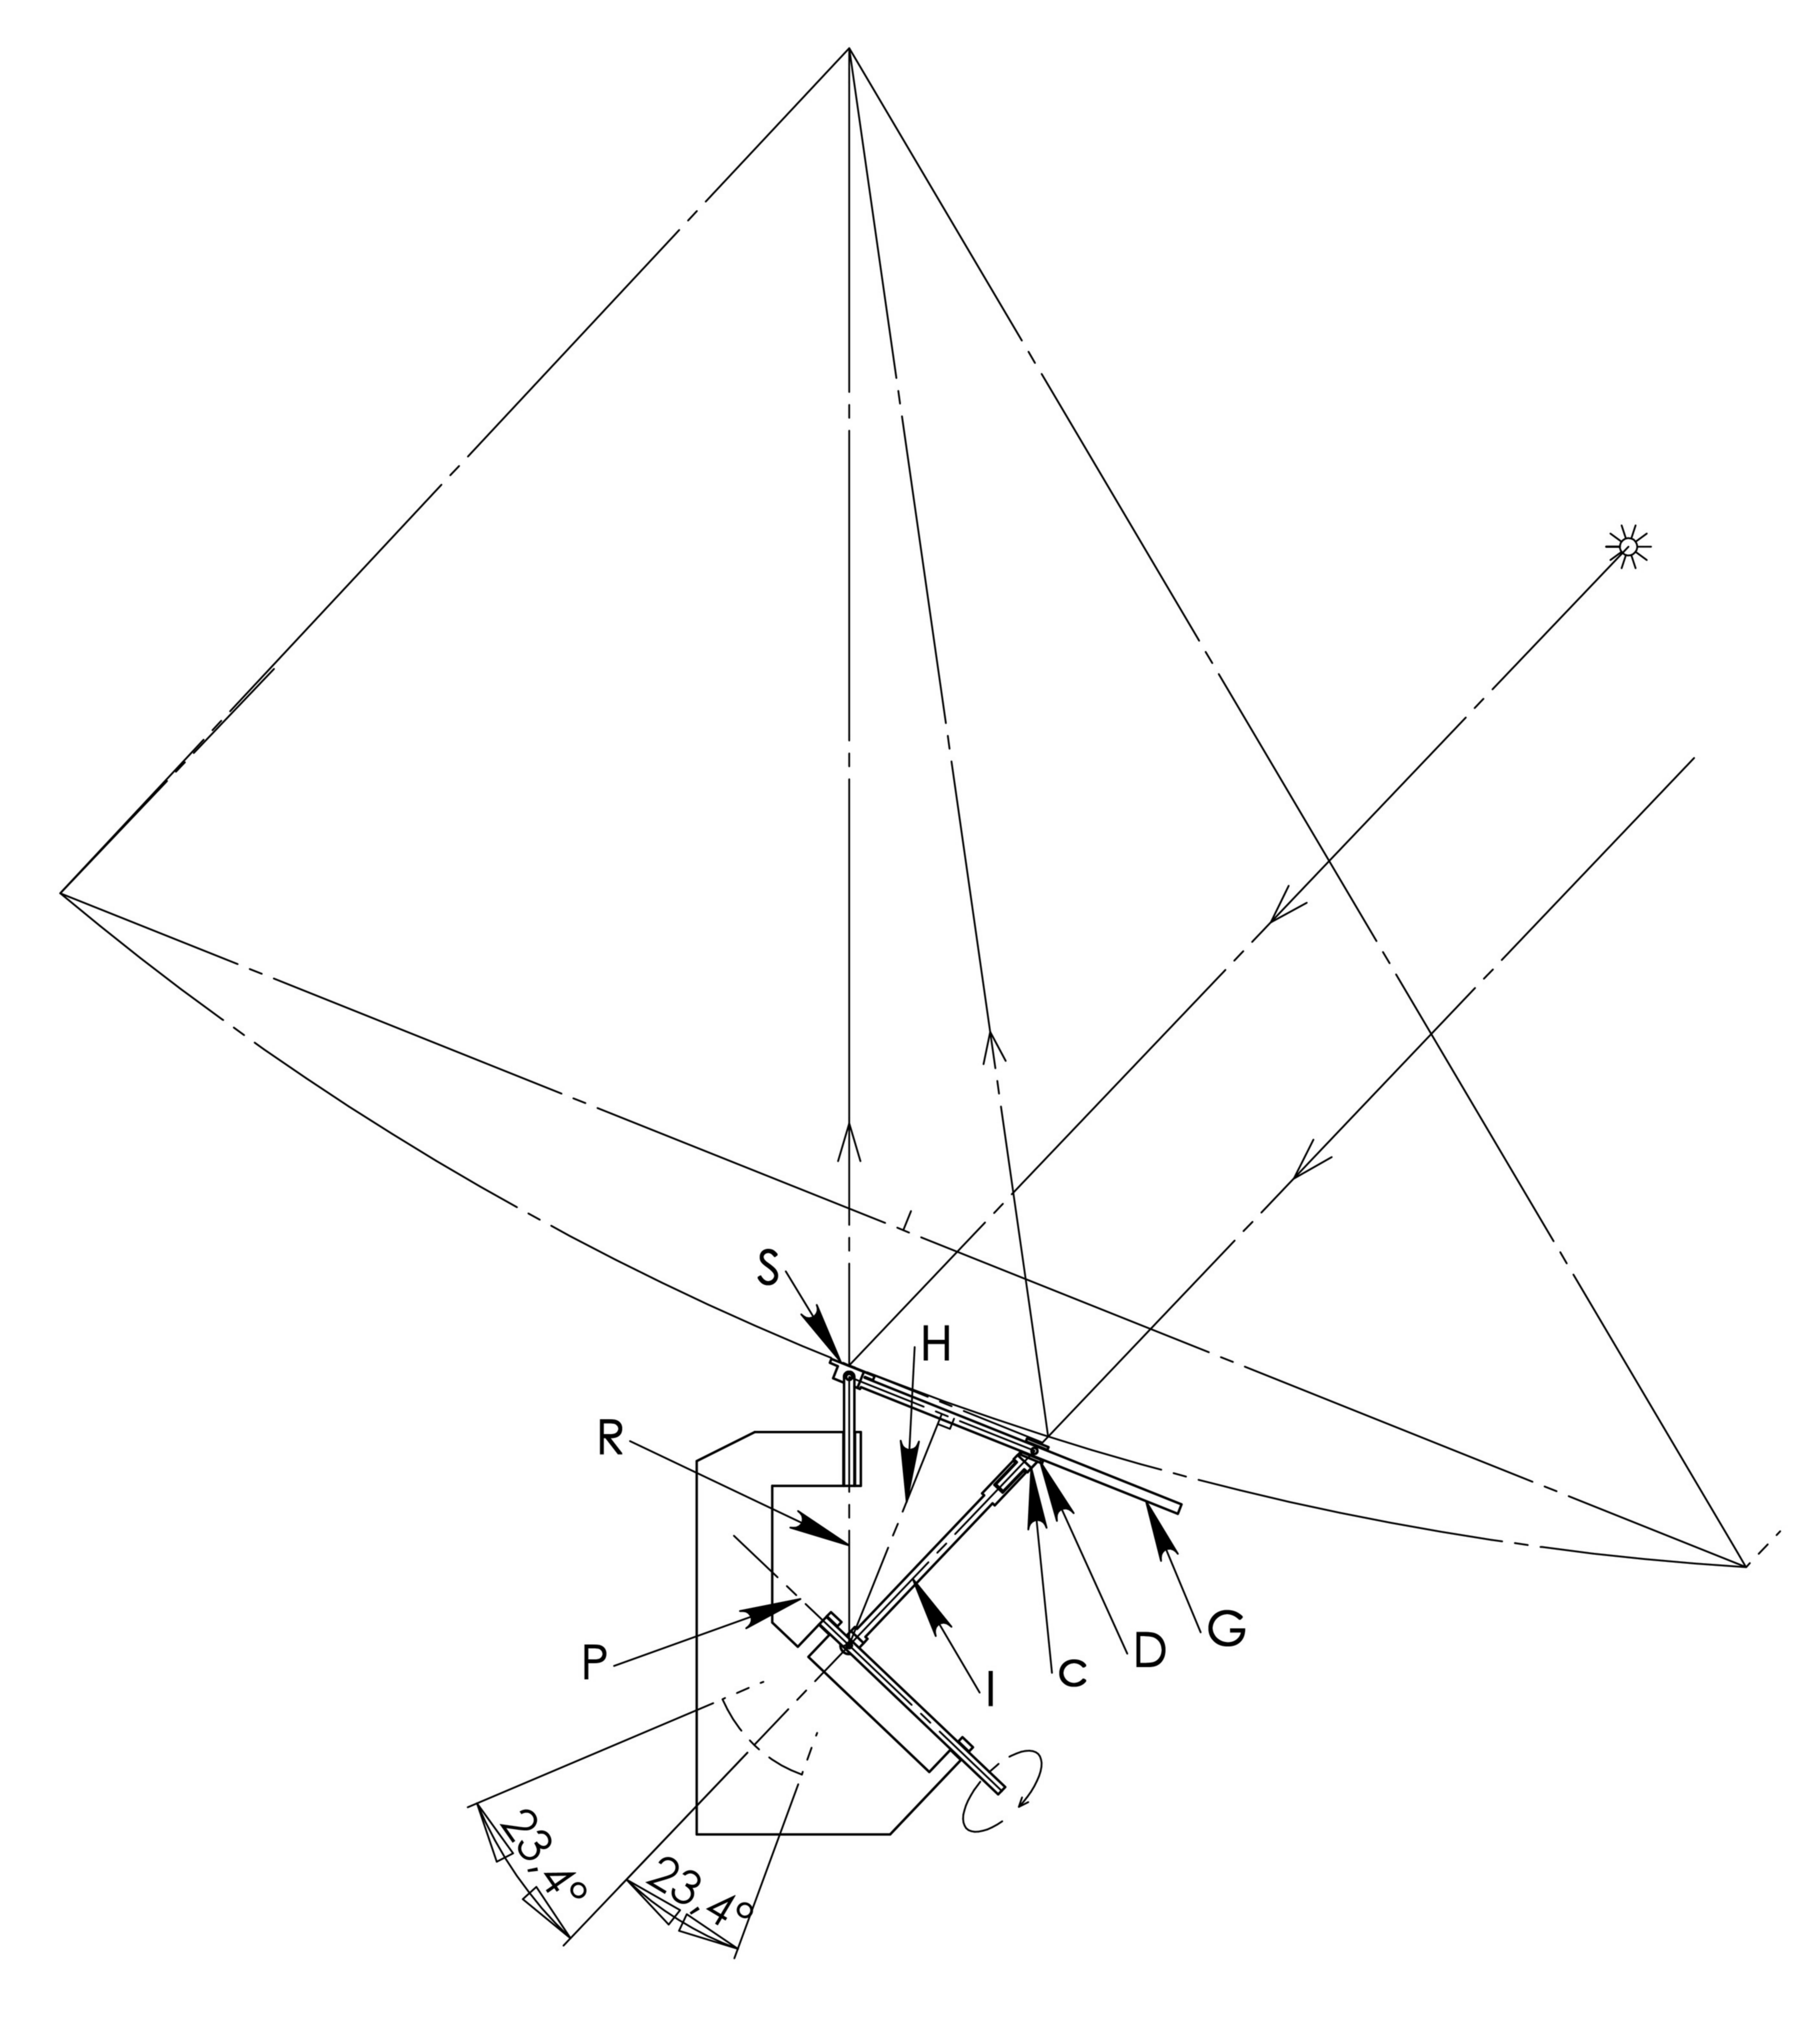 schéma mécanisme de guidage